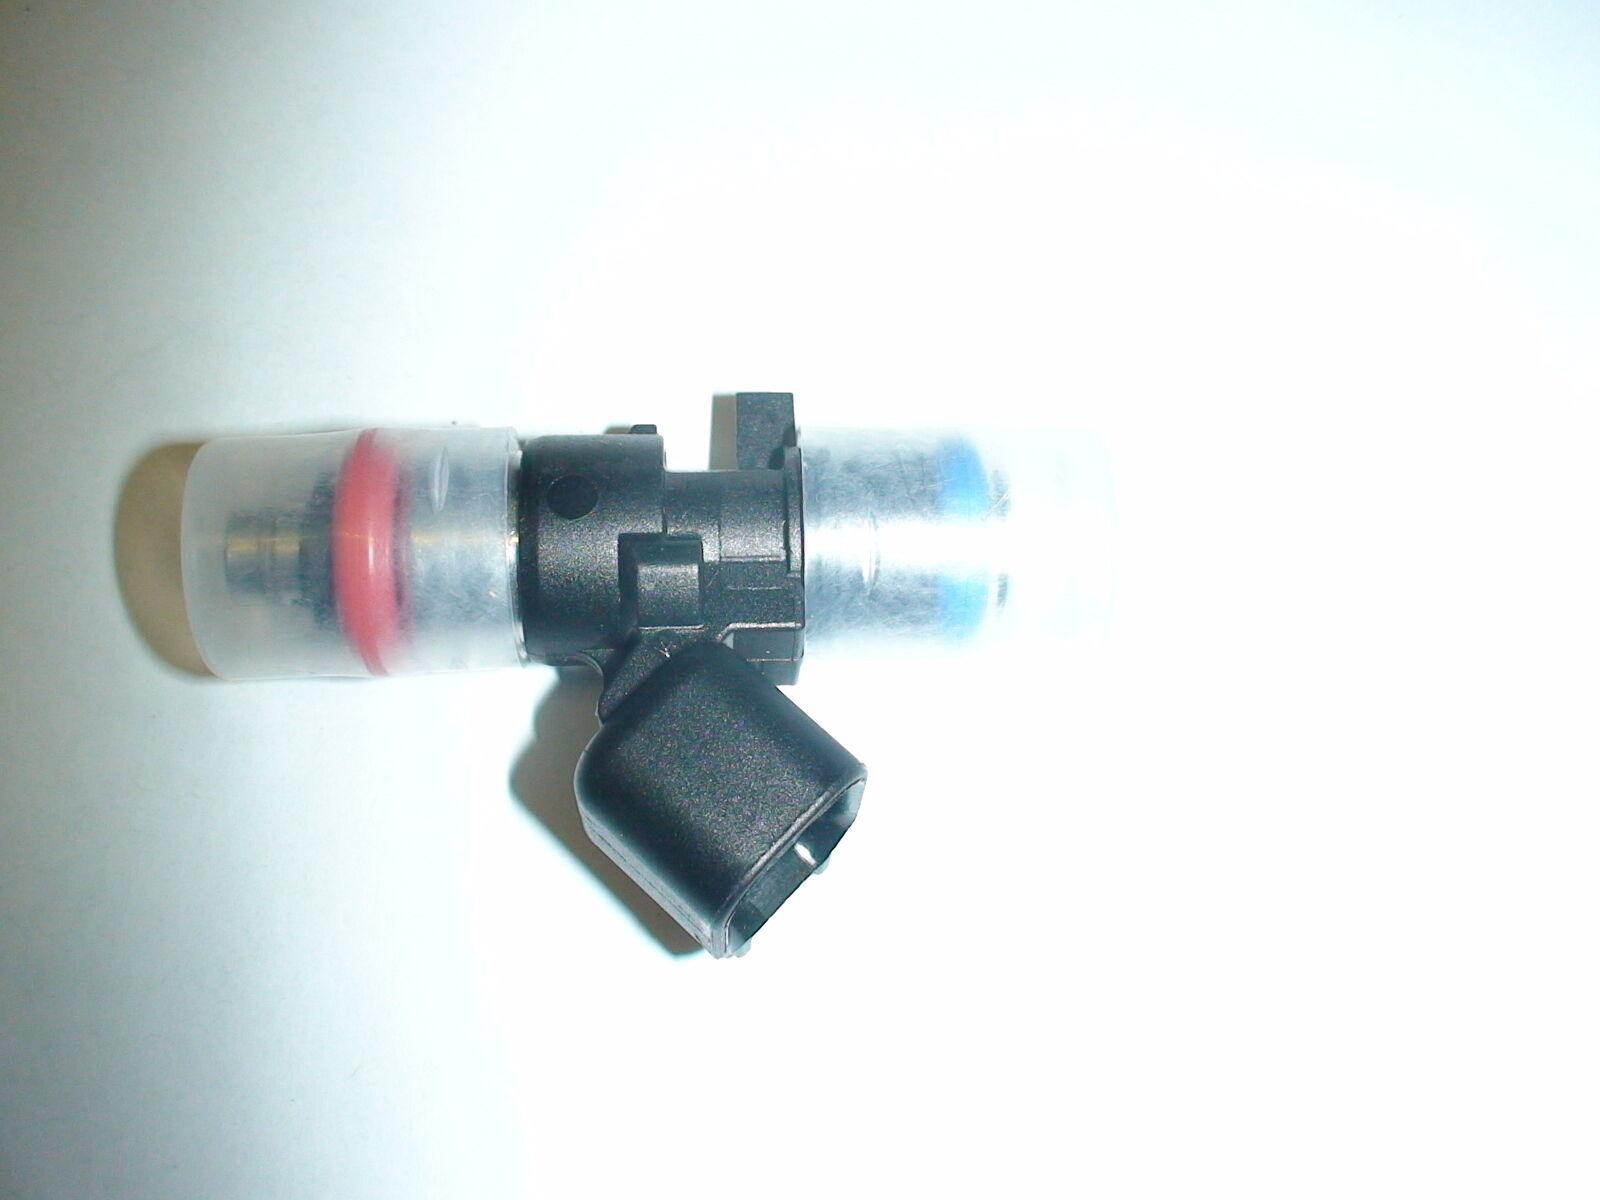 Cadillac CTSV 6.2 LSA Genuine Bosch 210lb 2200cc  fuel injectors Camaro ZL1